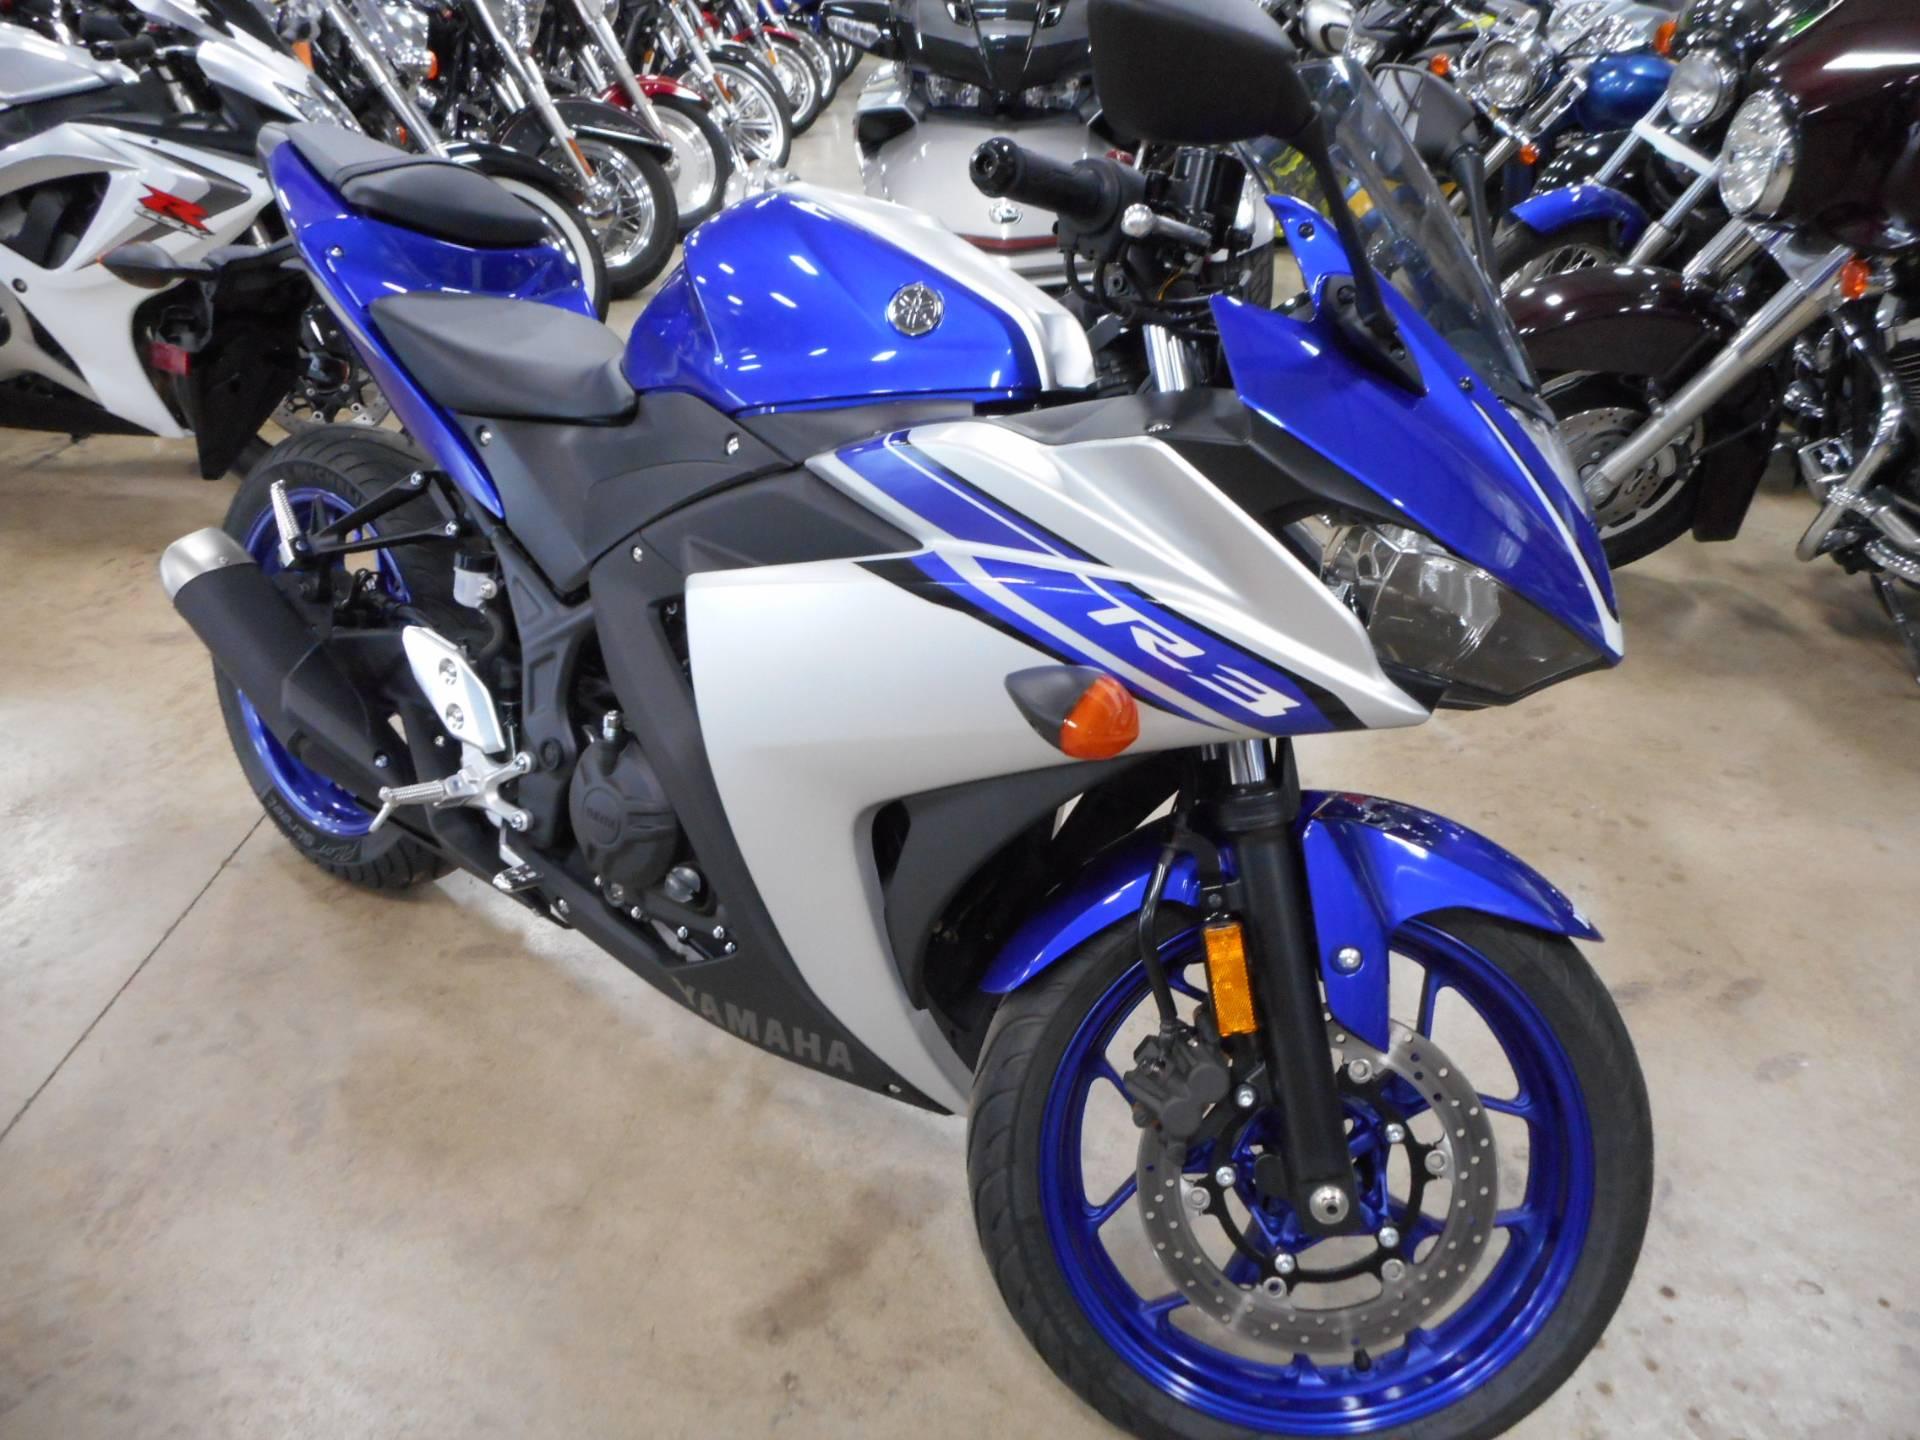 2016 Yamaha YZF-R3 for sale 107011